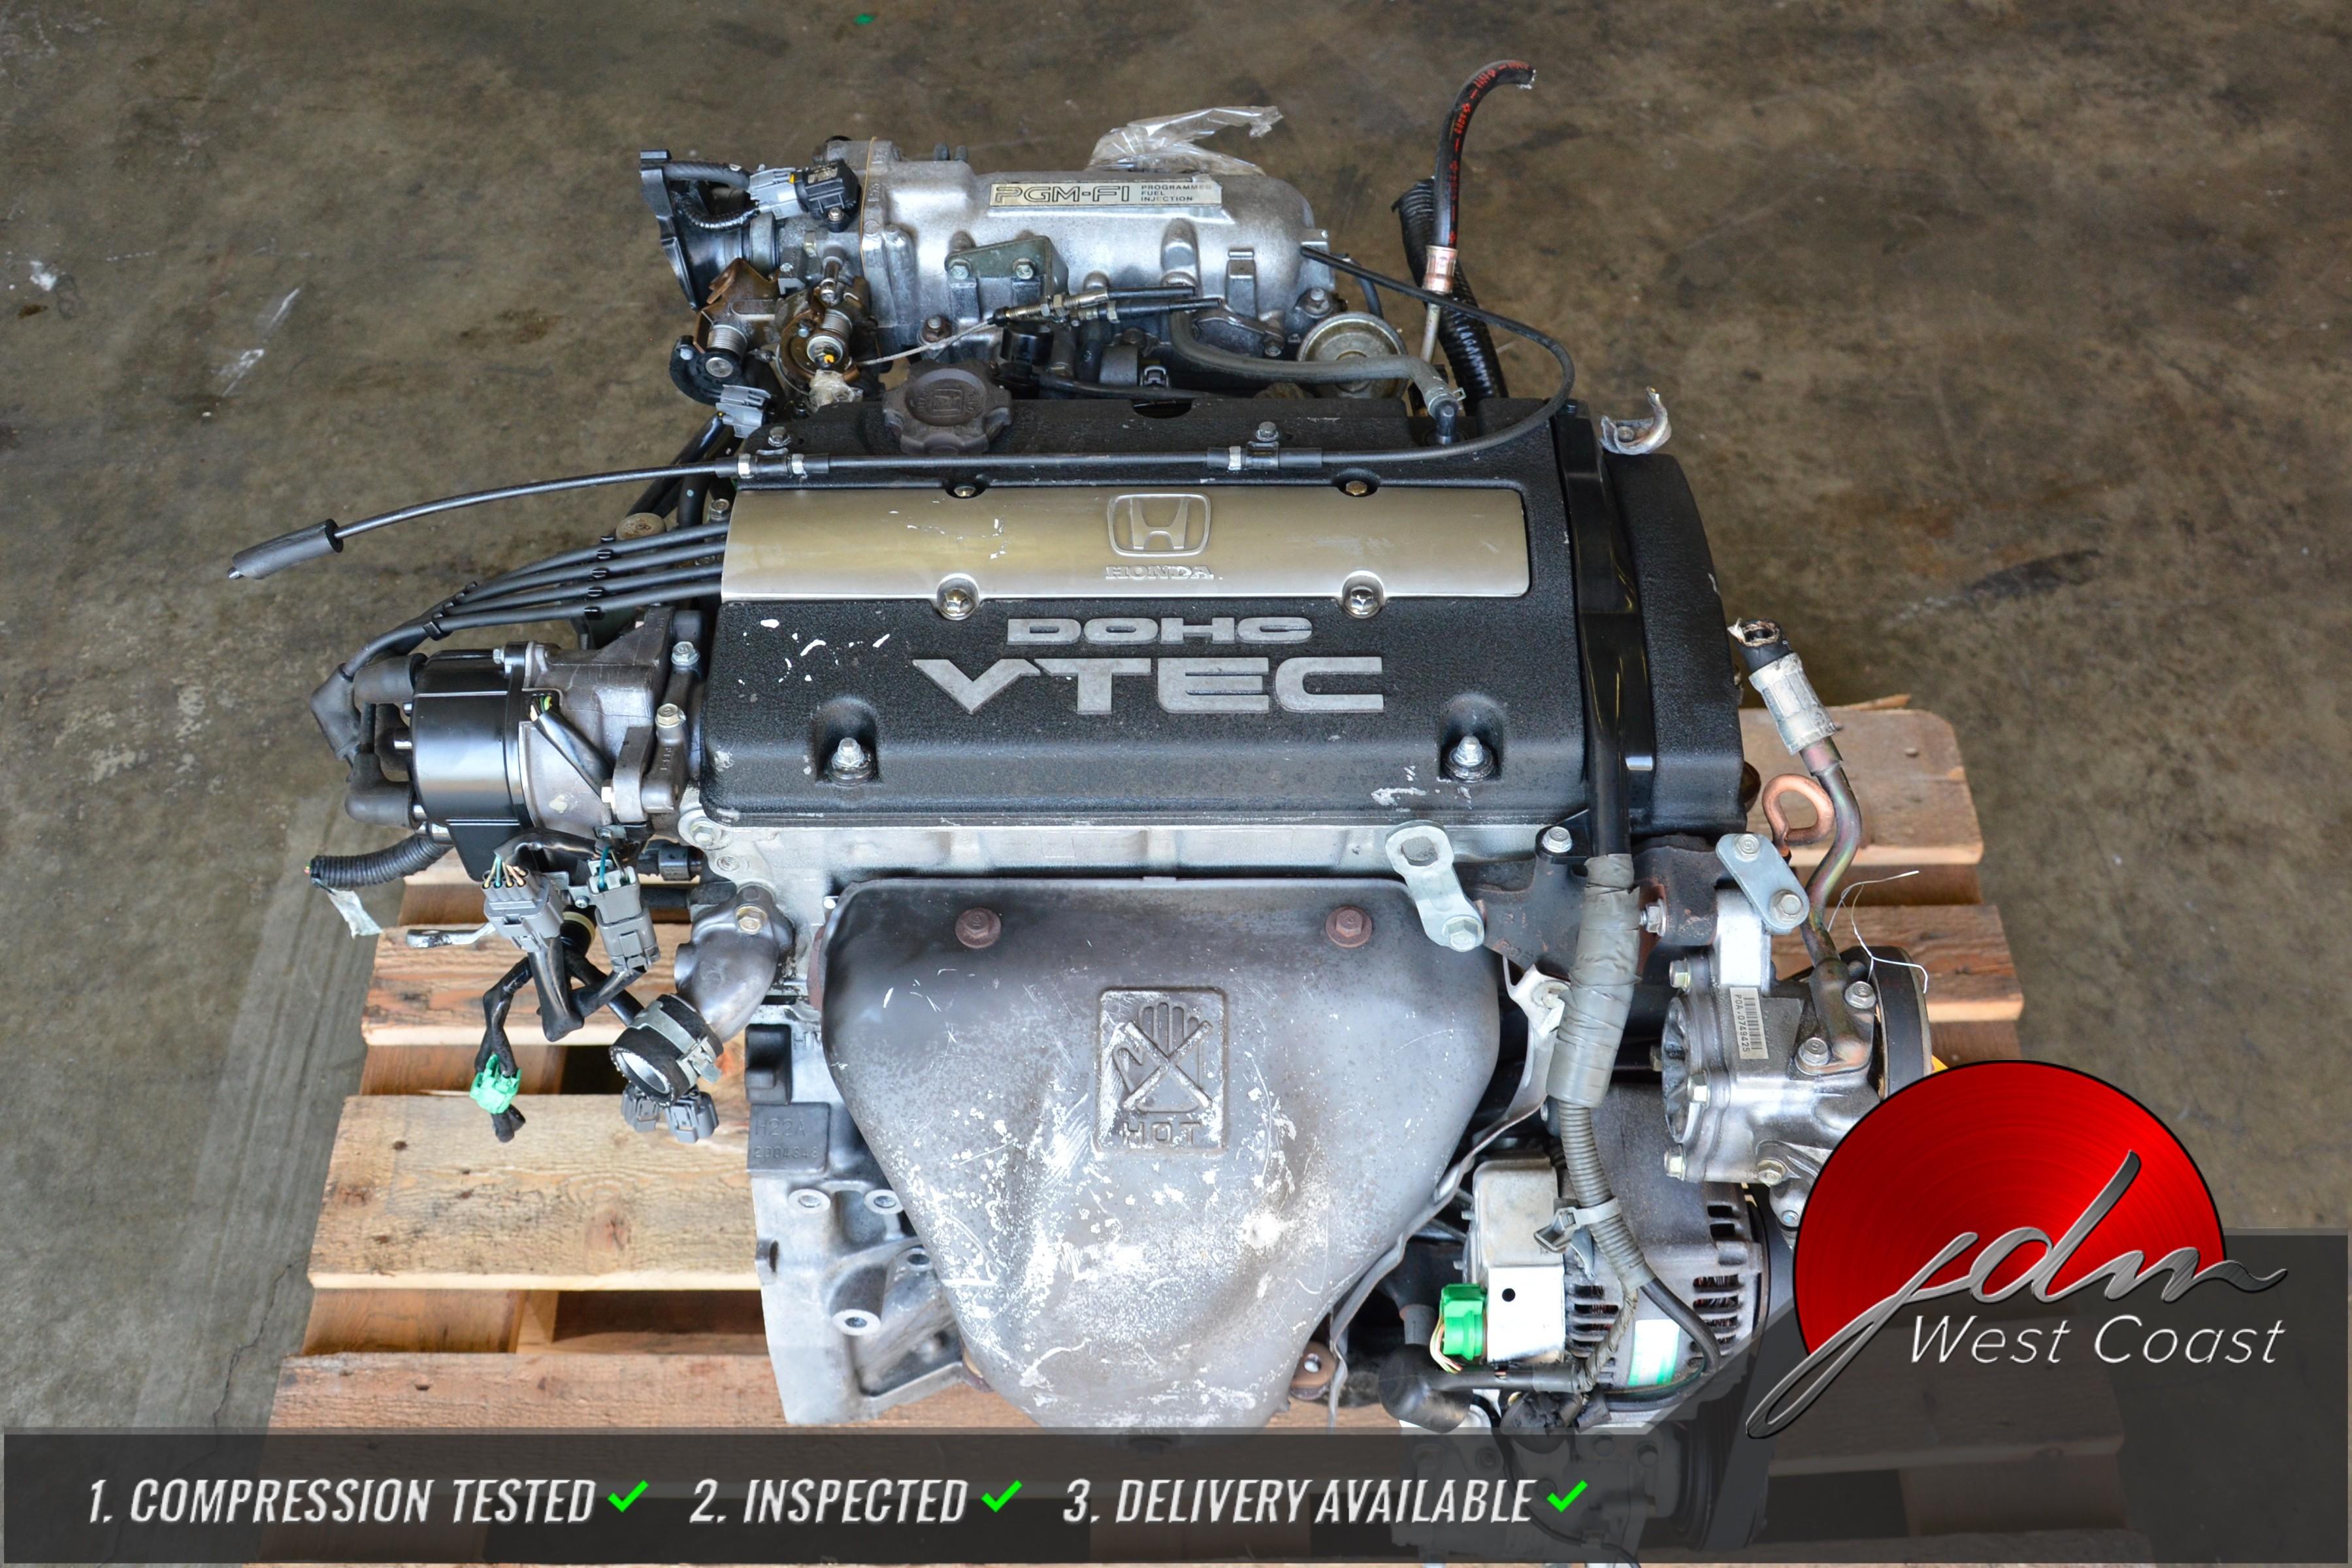 JDM H22A 92-95 HONDA PRELUDE 2.2L DOHC OBD1 VTEC ENGINE